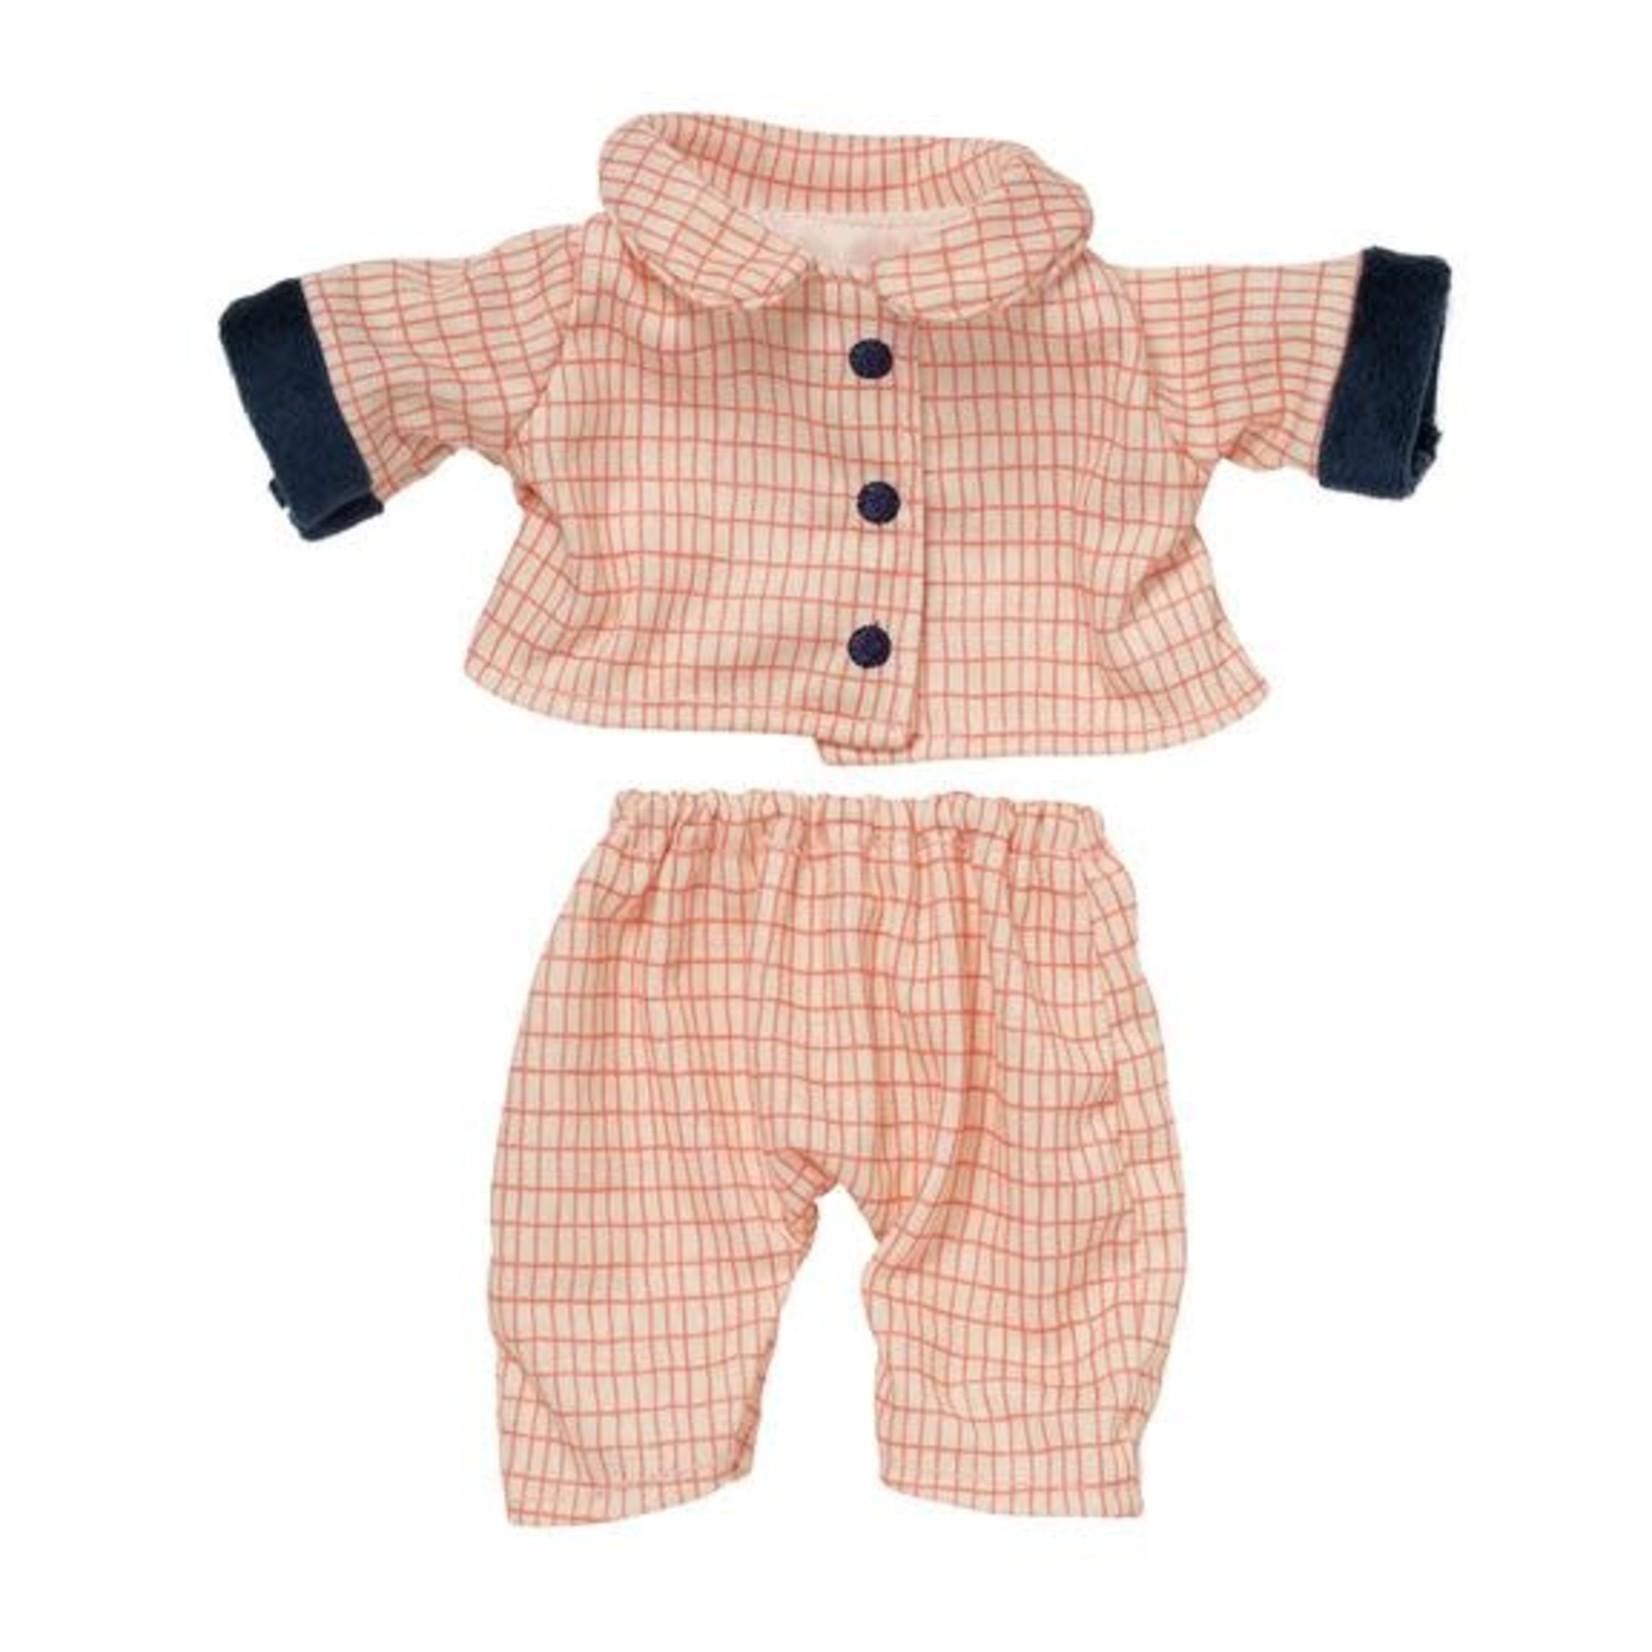 Manhattan Toy Wee Baby Stella - Sleep Tight Outfit